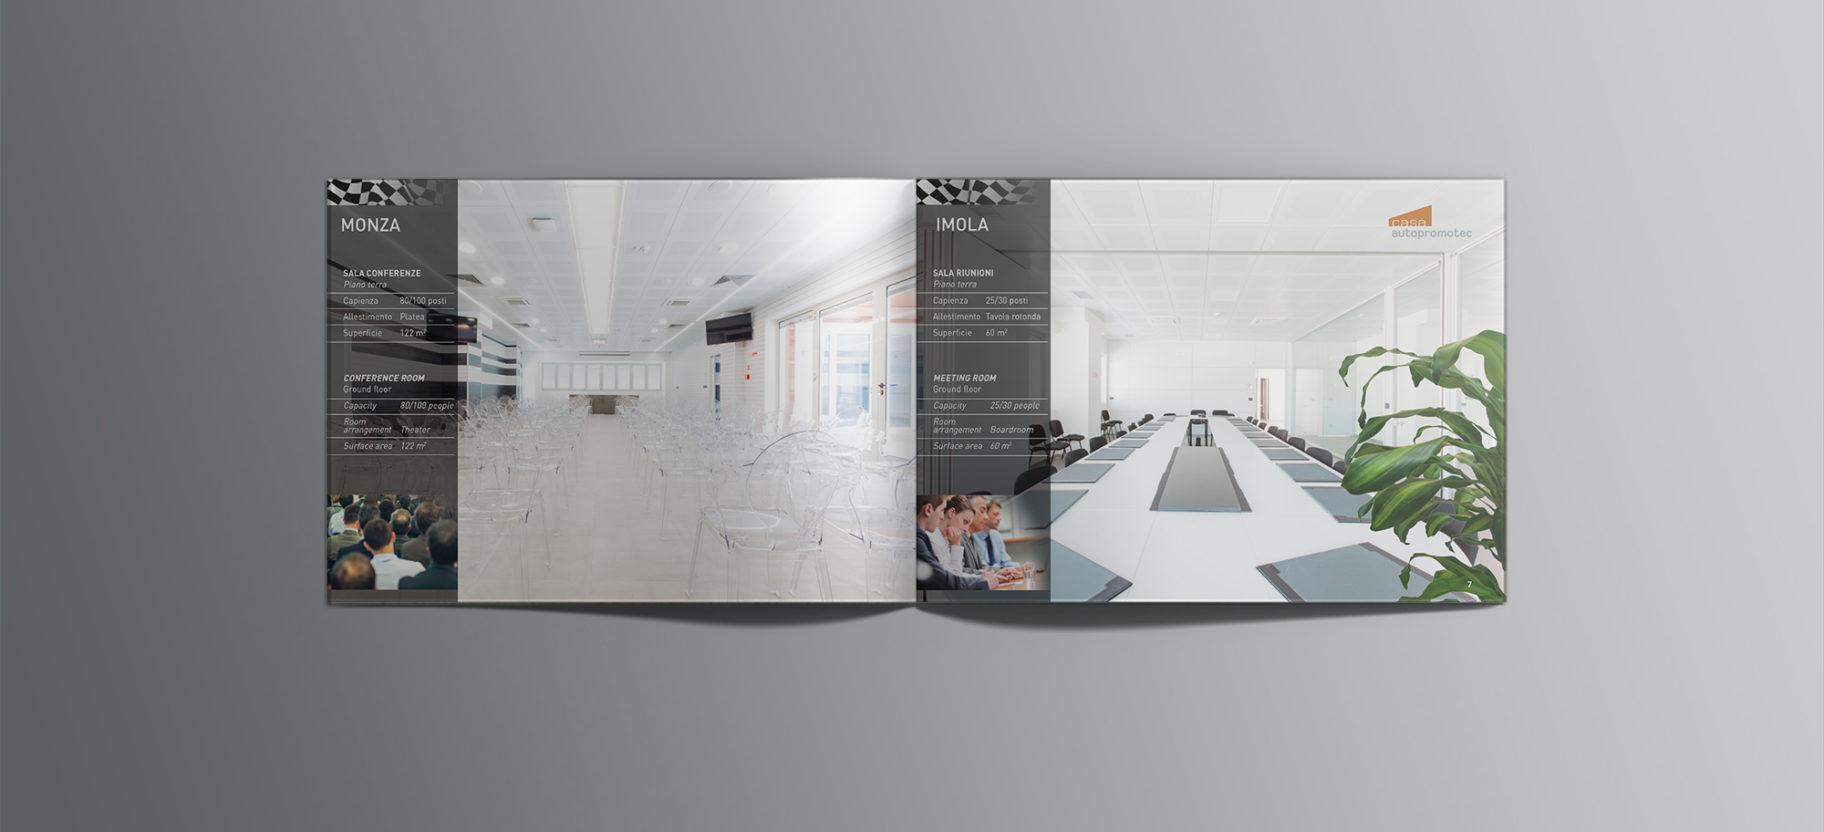 Casa Autopromotec-Brochure-02